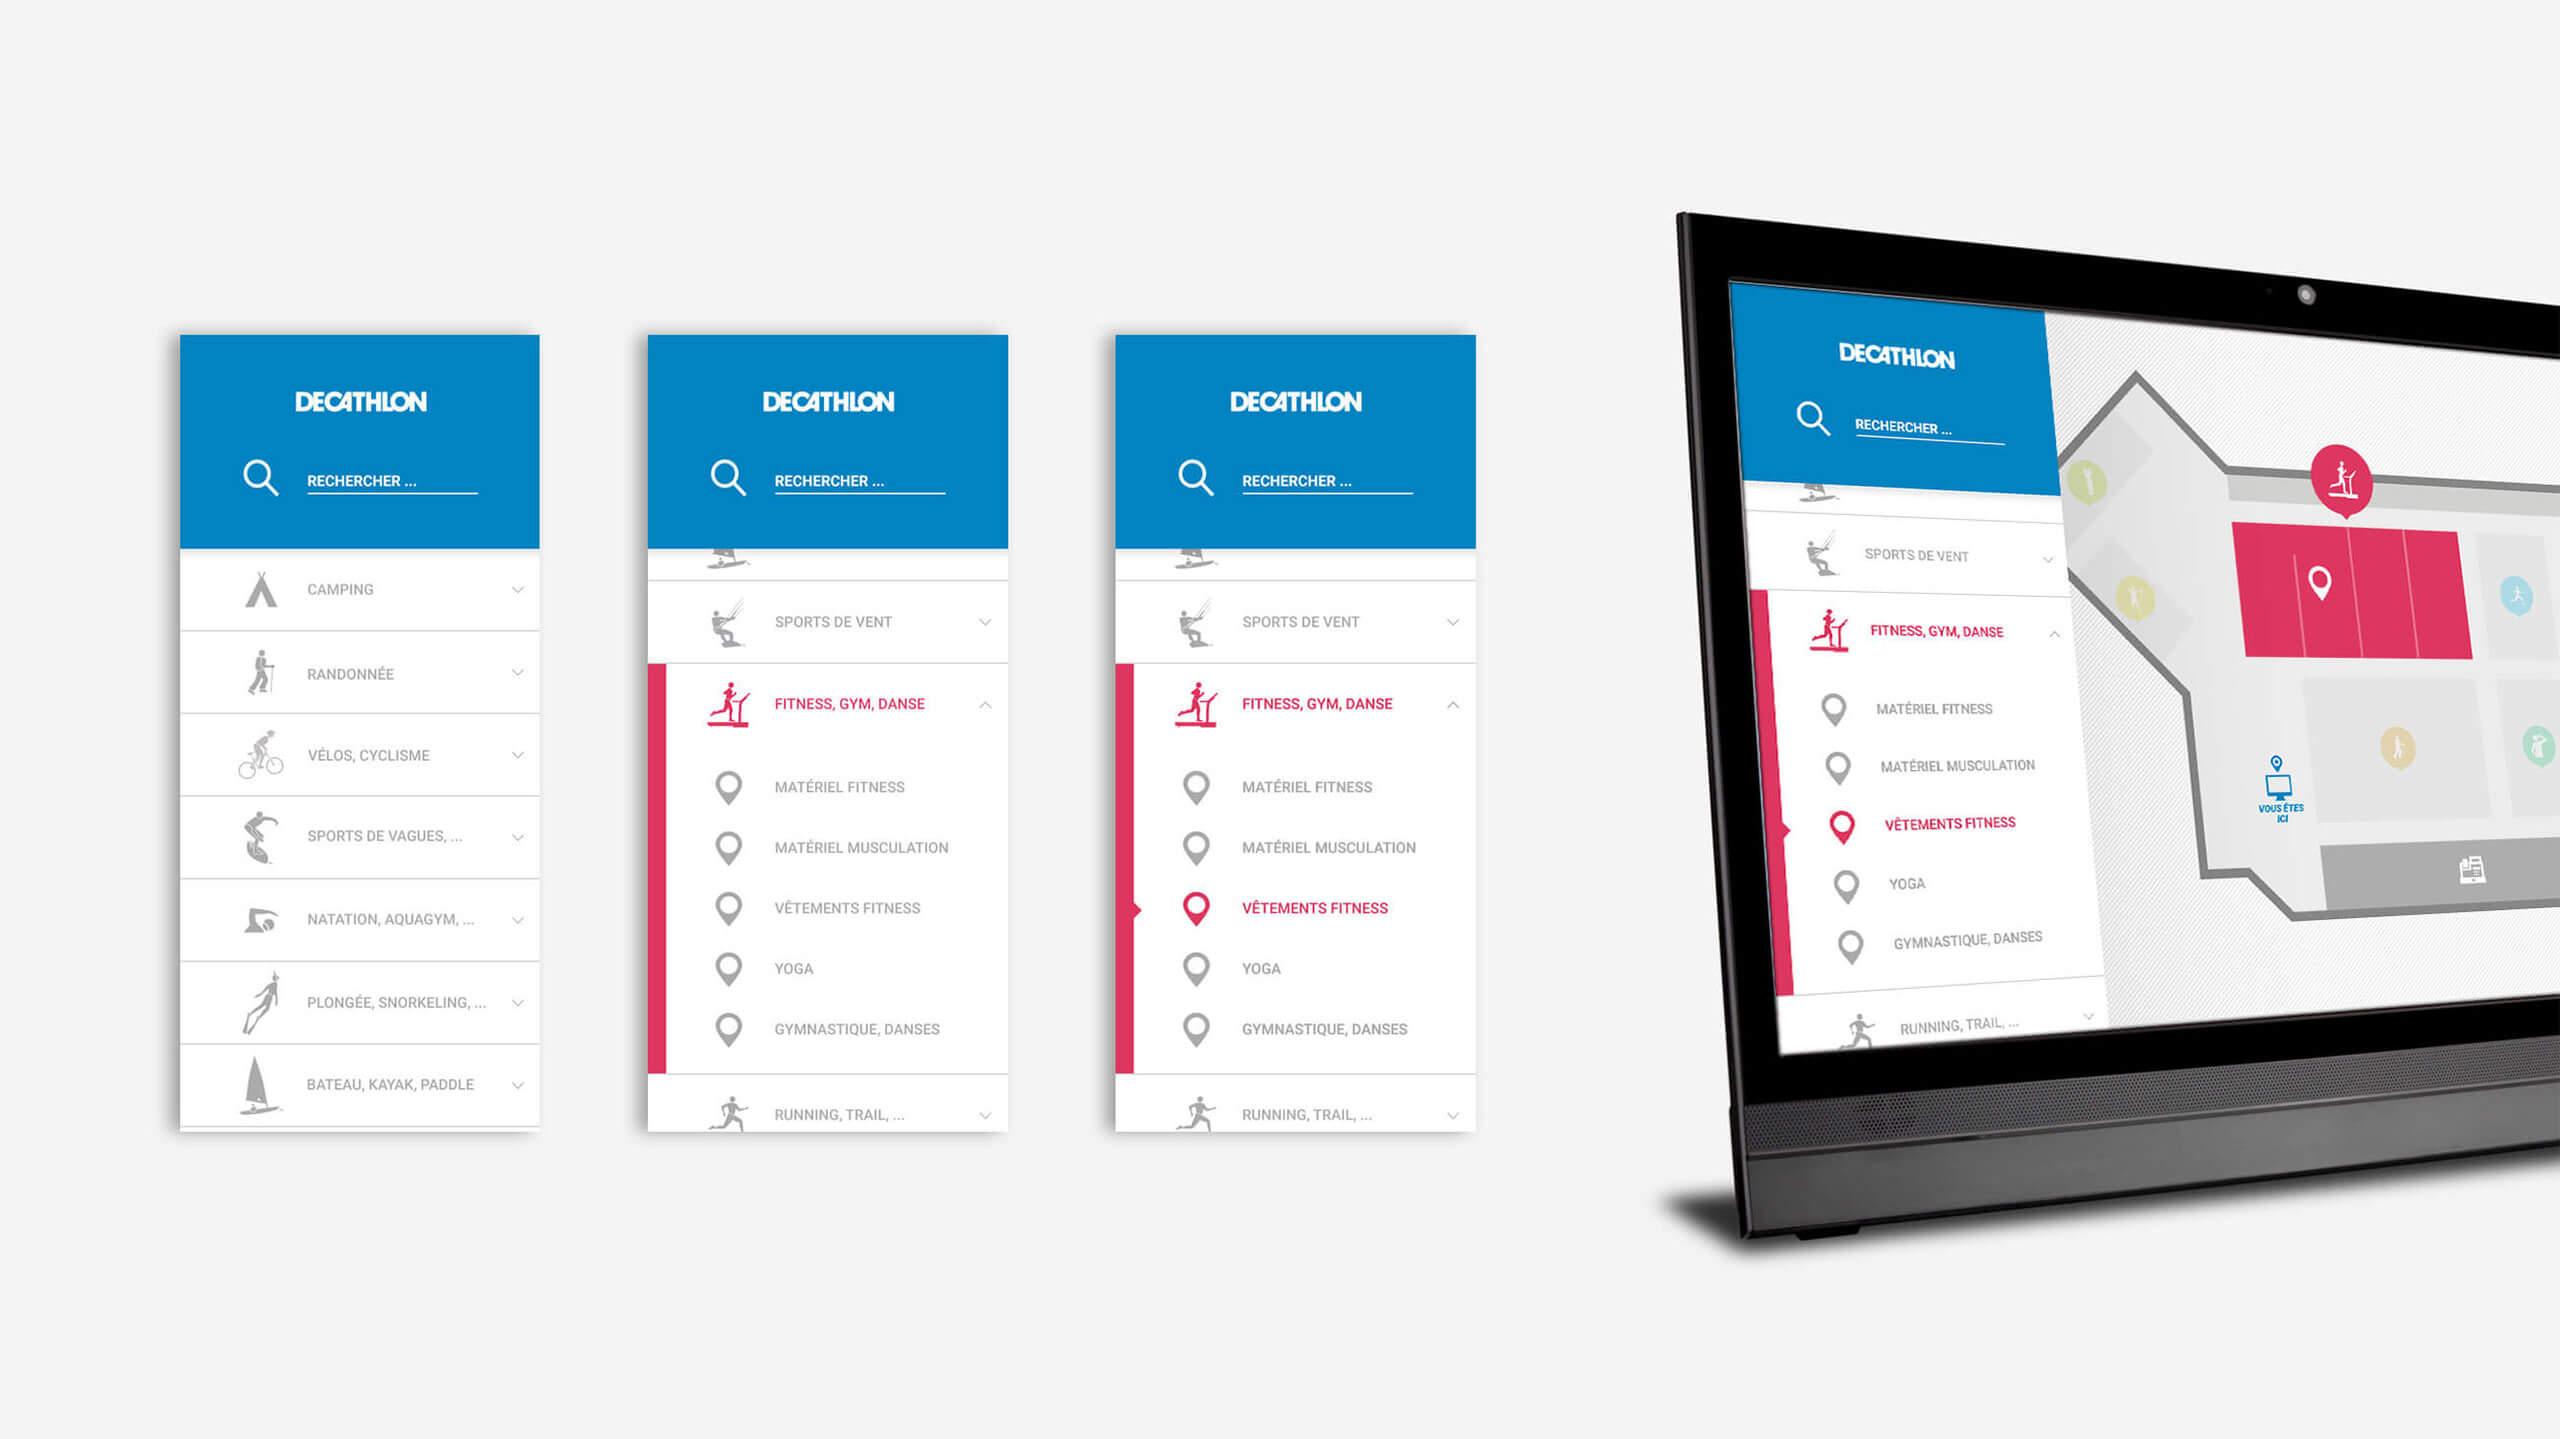 decathlon-plan-webdesign-webdesigner-freelance-05